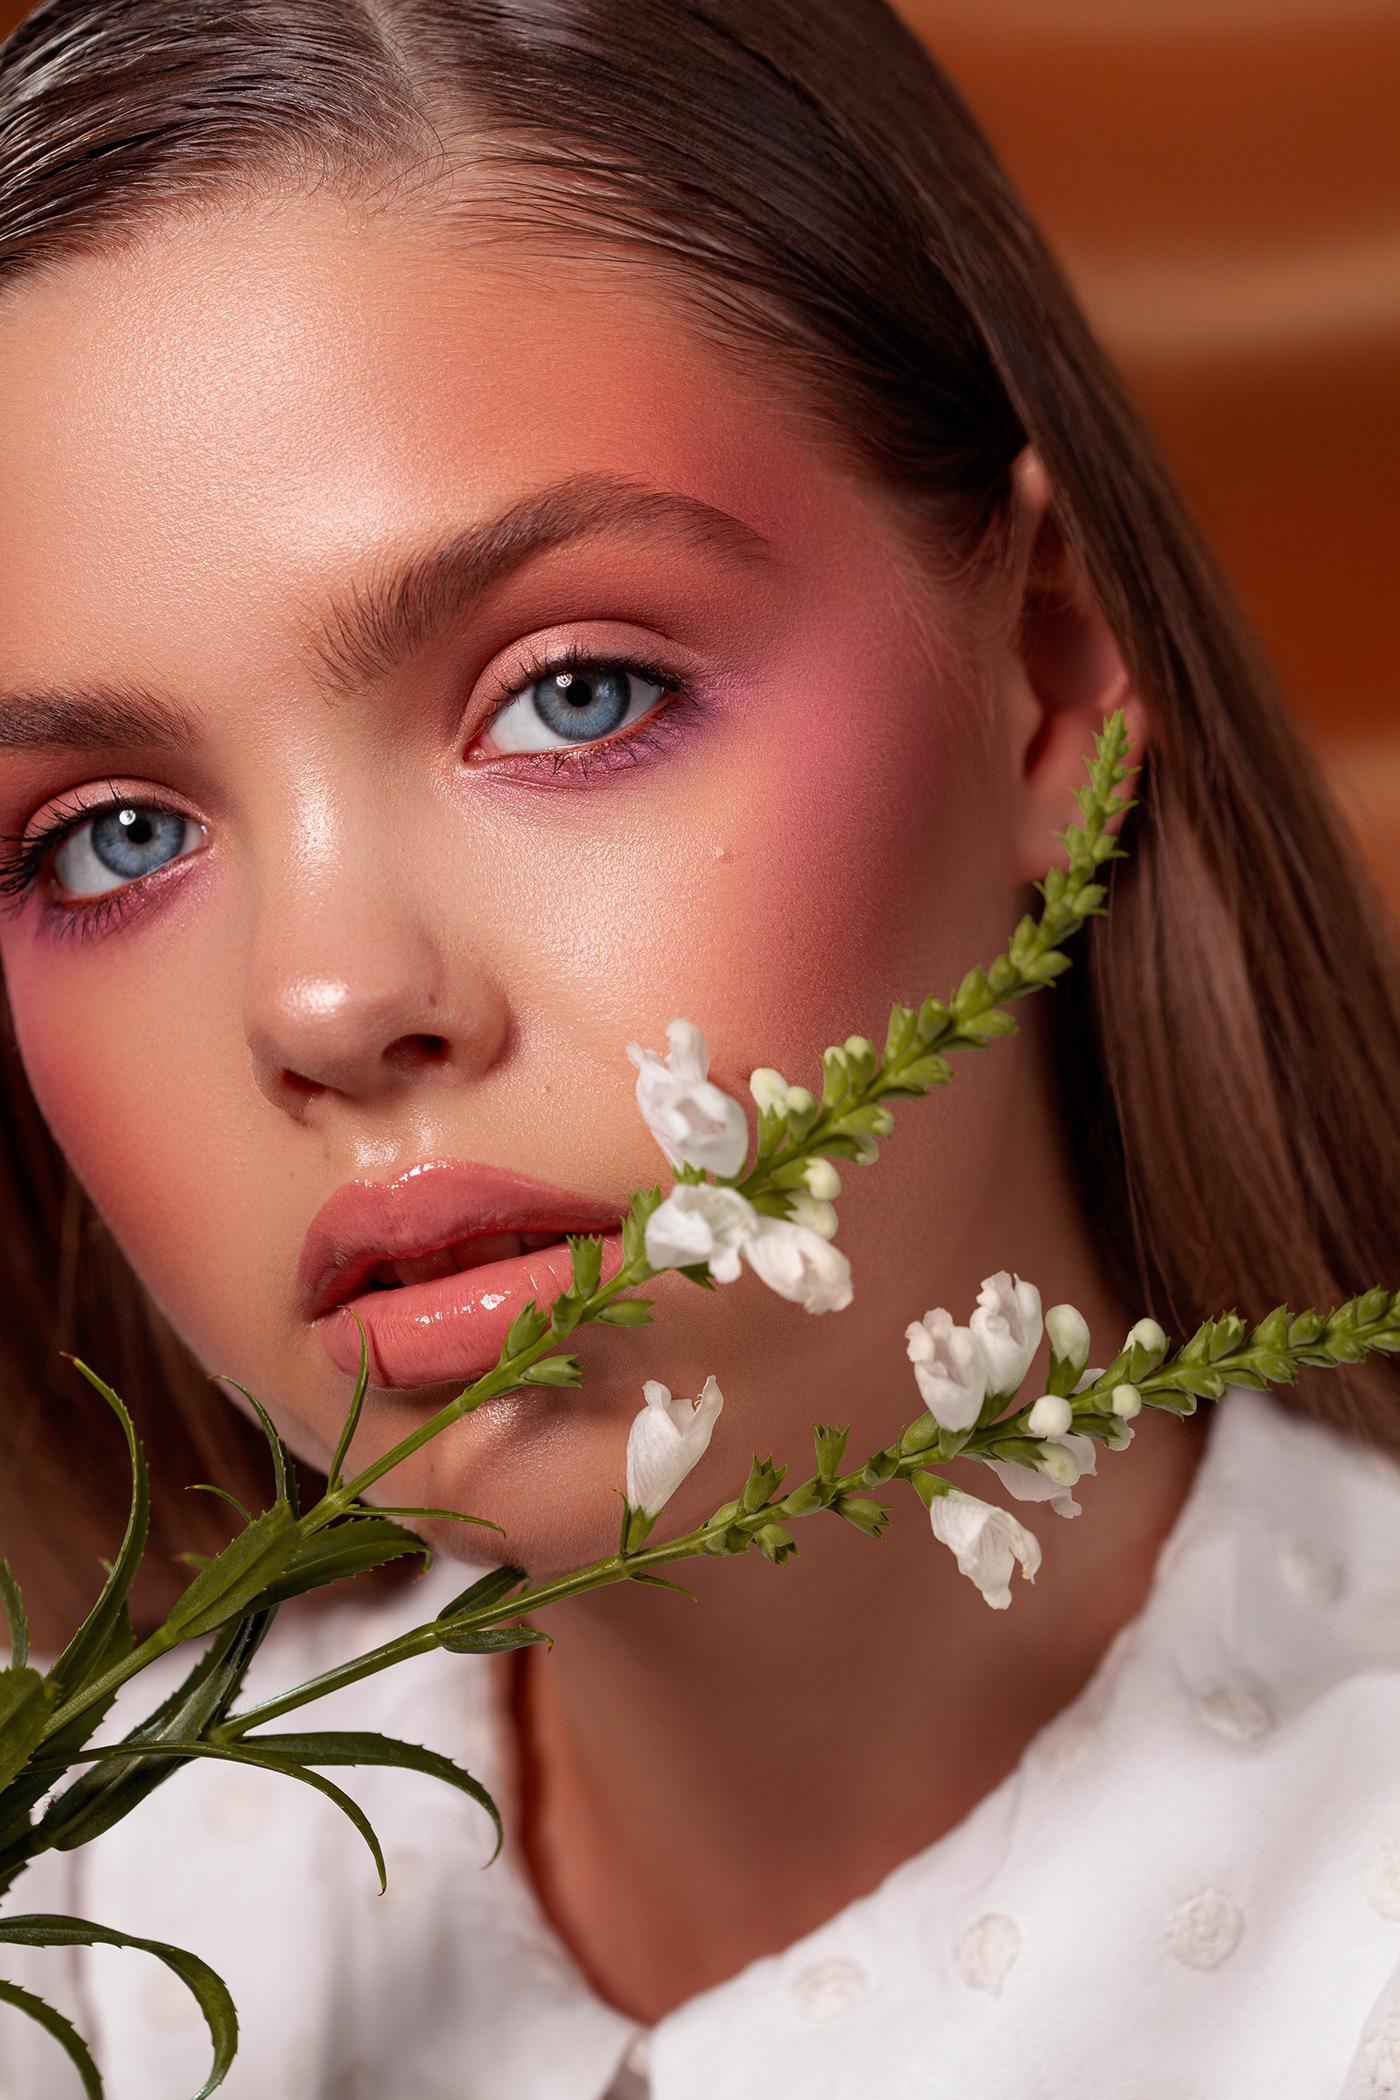 beauty beauty retouch clodeup hi end makeup retouch retouching  skin etouch